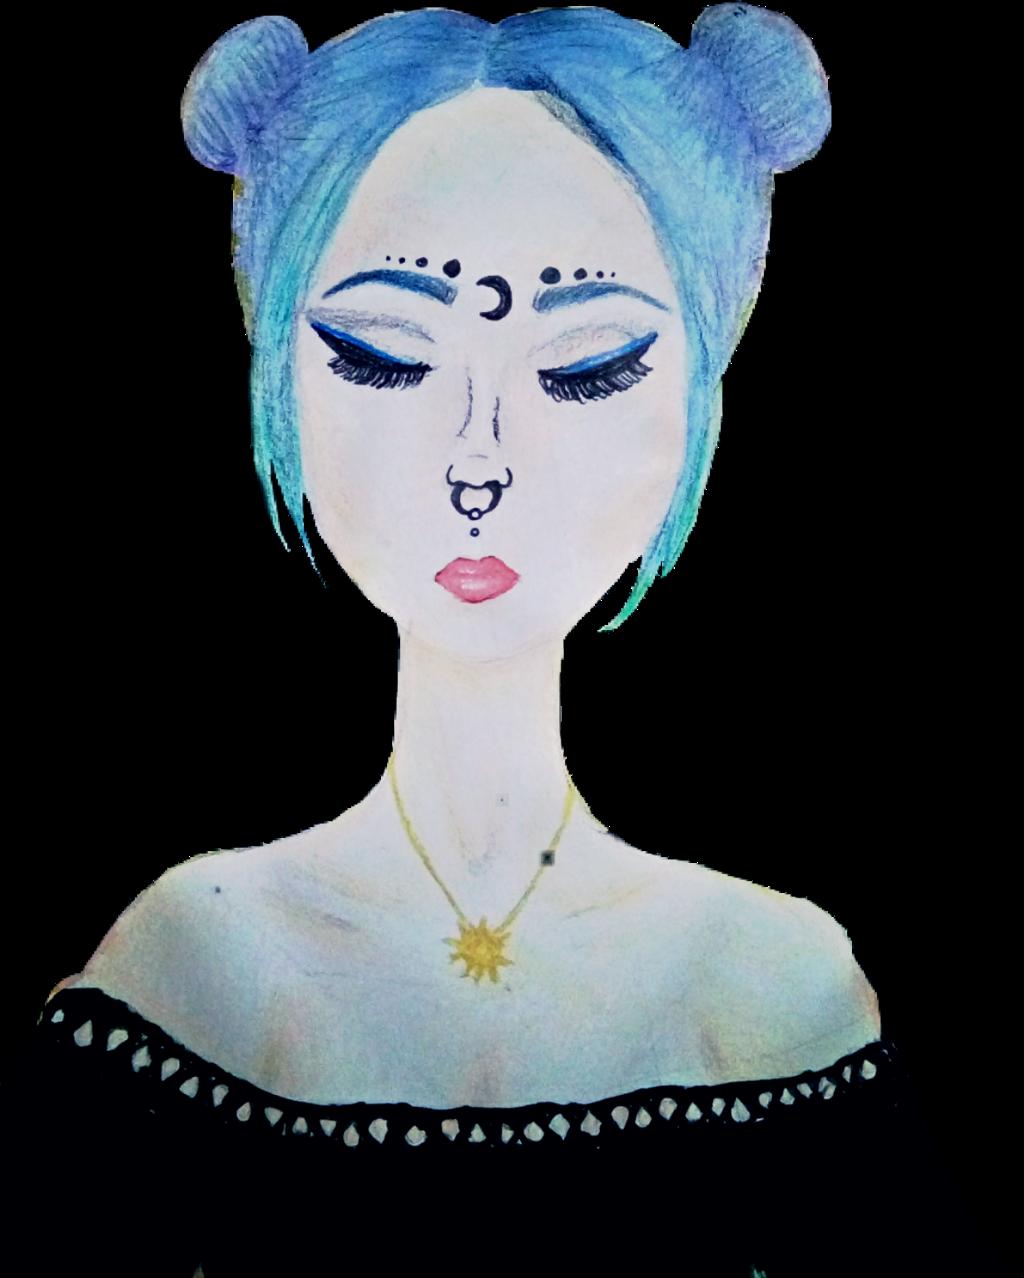 #tumblrgirl #tumblr #girl #drawing #pencilart #art #bluehair #moon